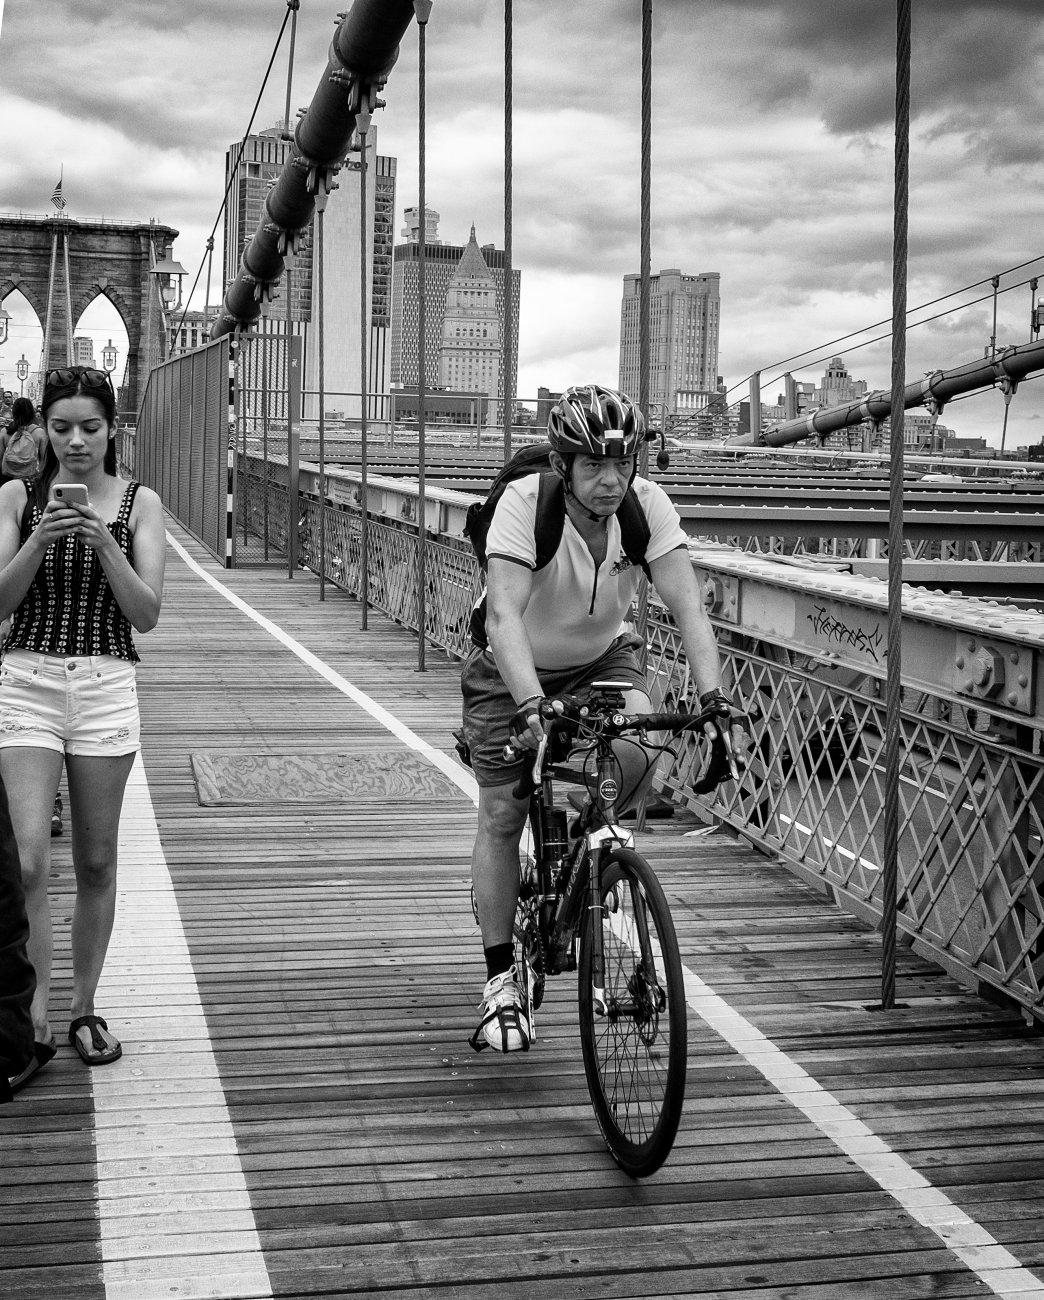 Crossing Brooklyn Bridge 1